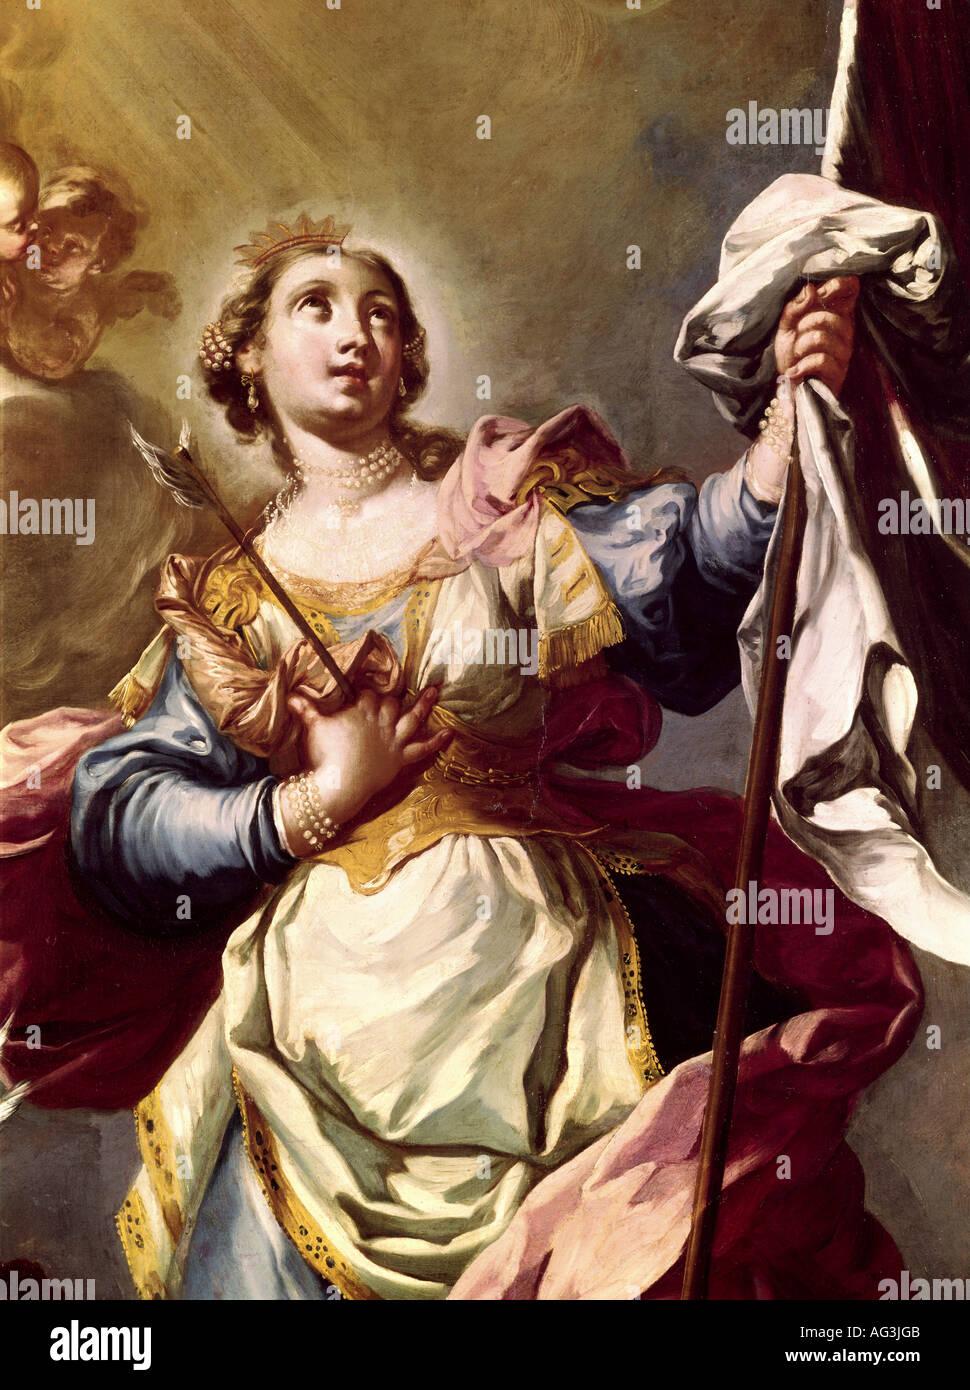 Bildende Kunst, Grasmayr, Johann Georg (1691 - 1751), Malerei, 'Saint Ursula', Detail, Diözesanmuseum, Brixen, Italien, Artist's Urheberrecht nicht gelöscht werden Stockbild